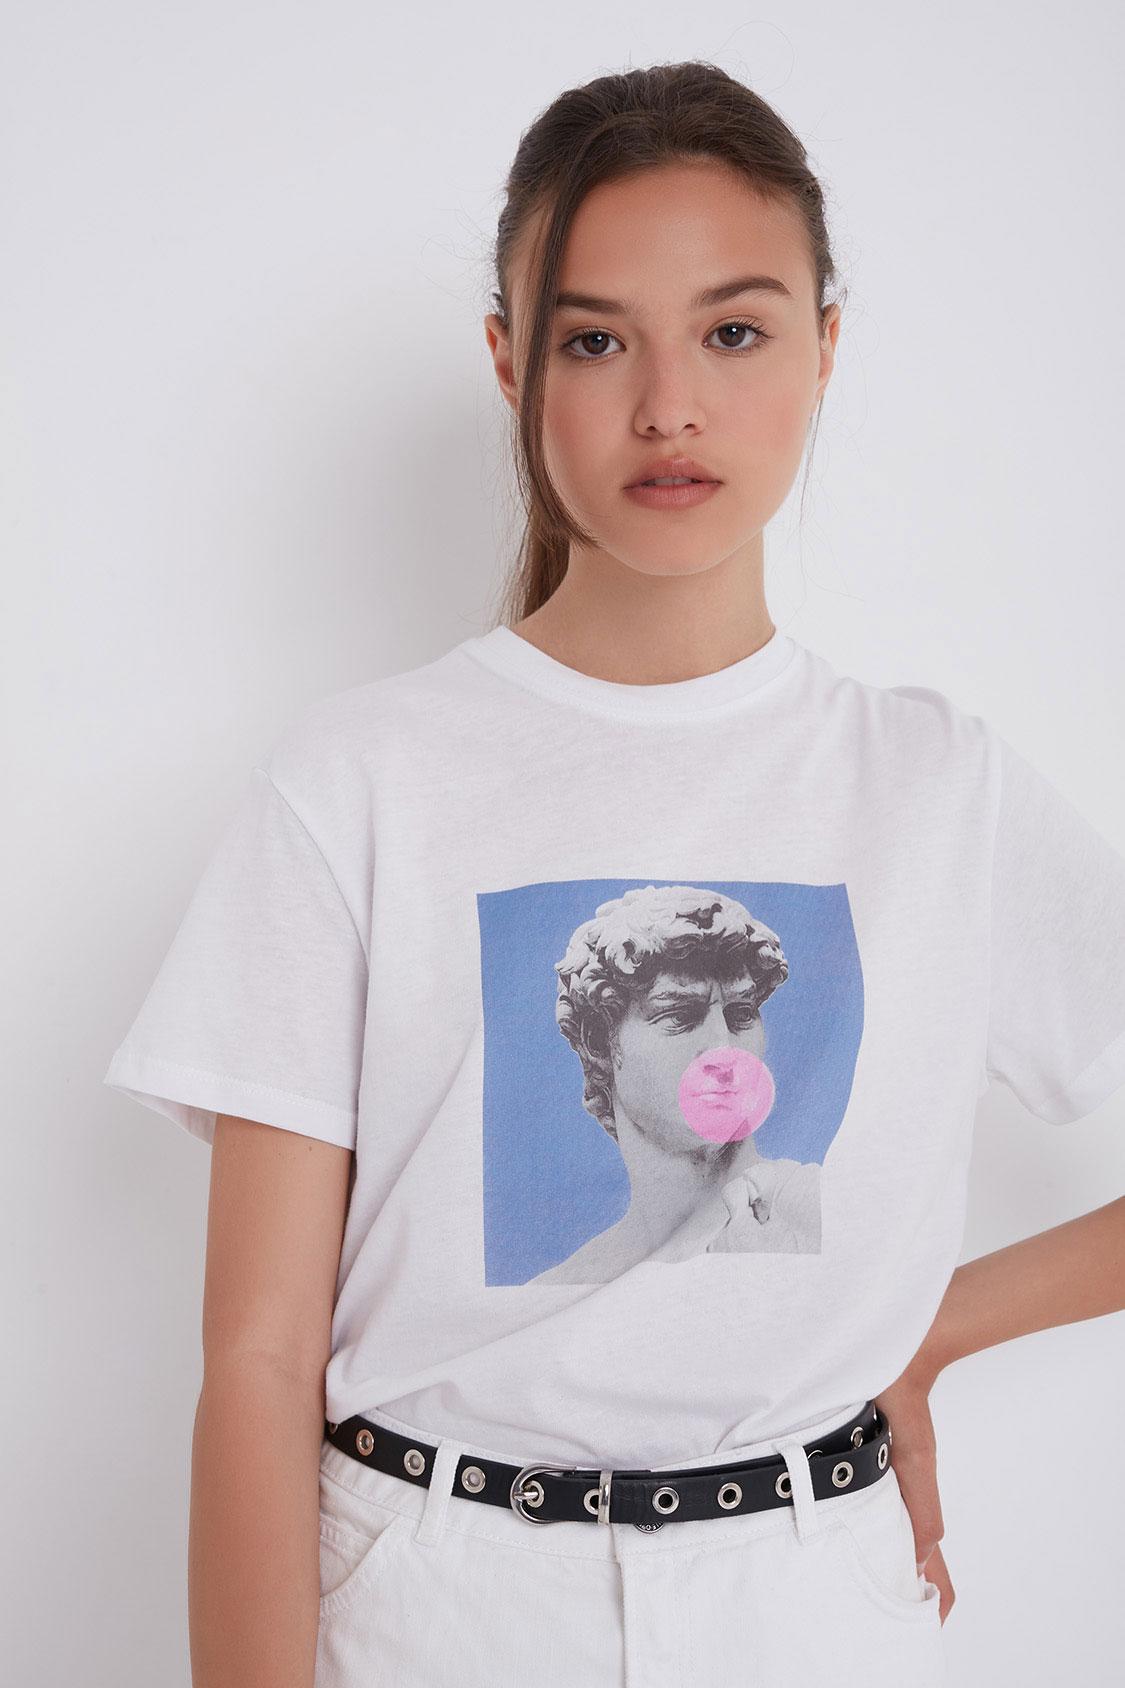 David printed t-shirt